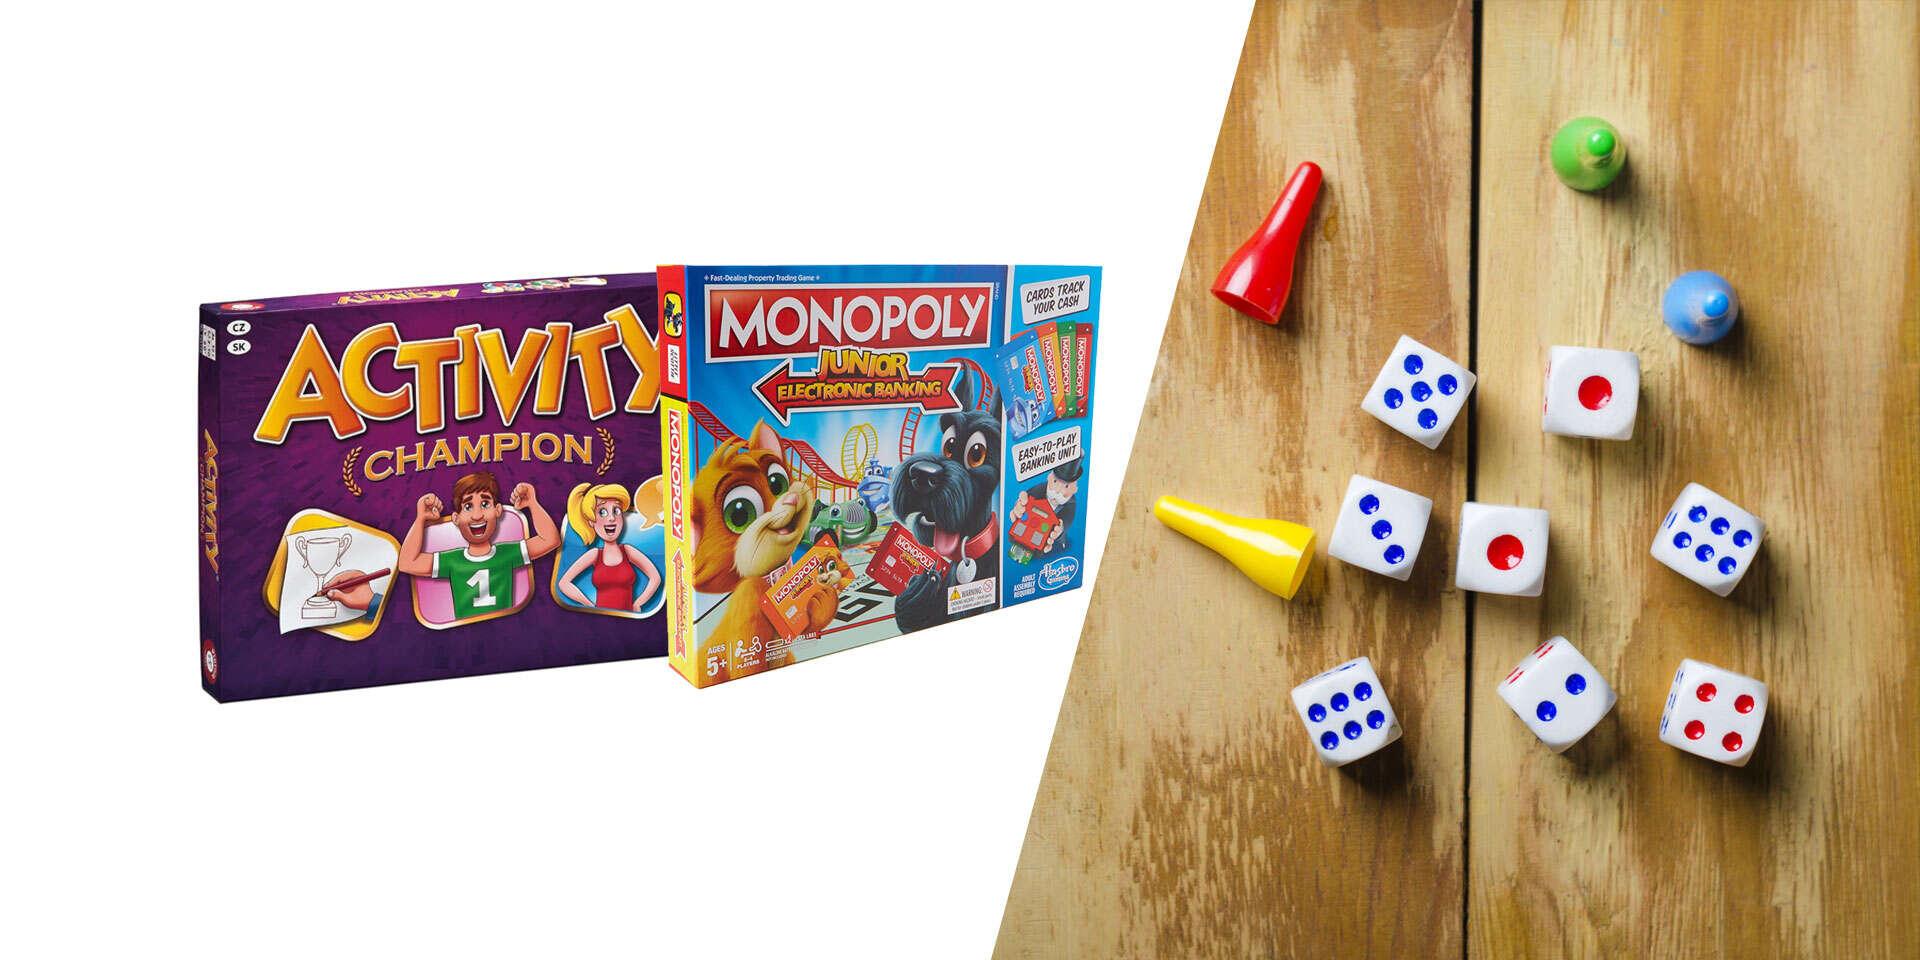 Spoločenské hry pre deti - Activity Champion alebo Monopoly Junior Electronic Banking